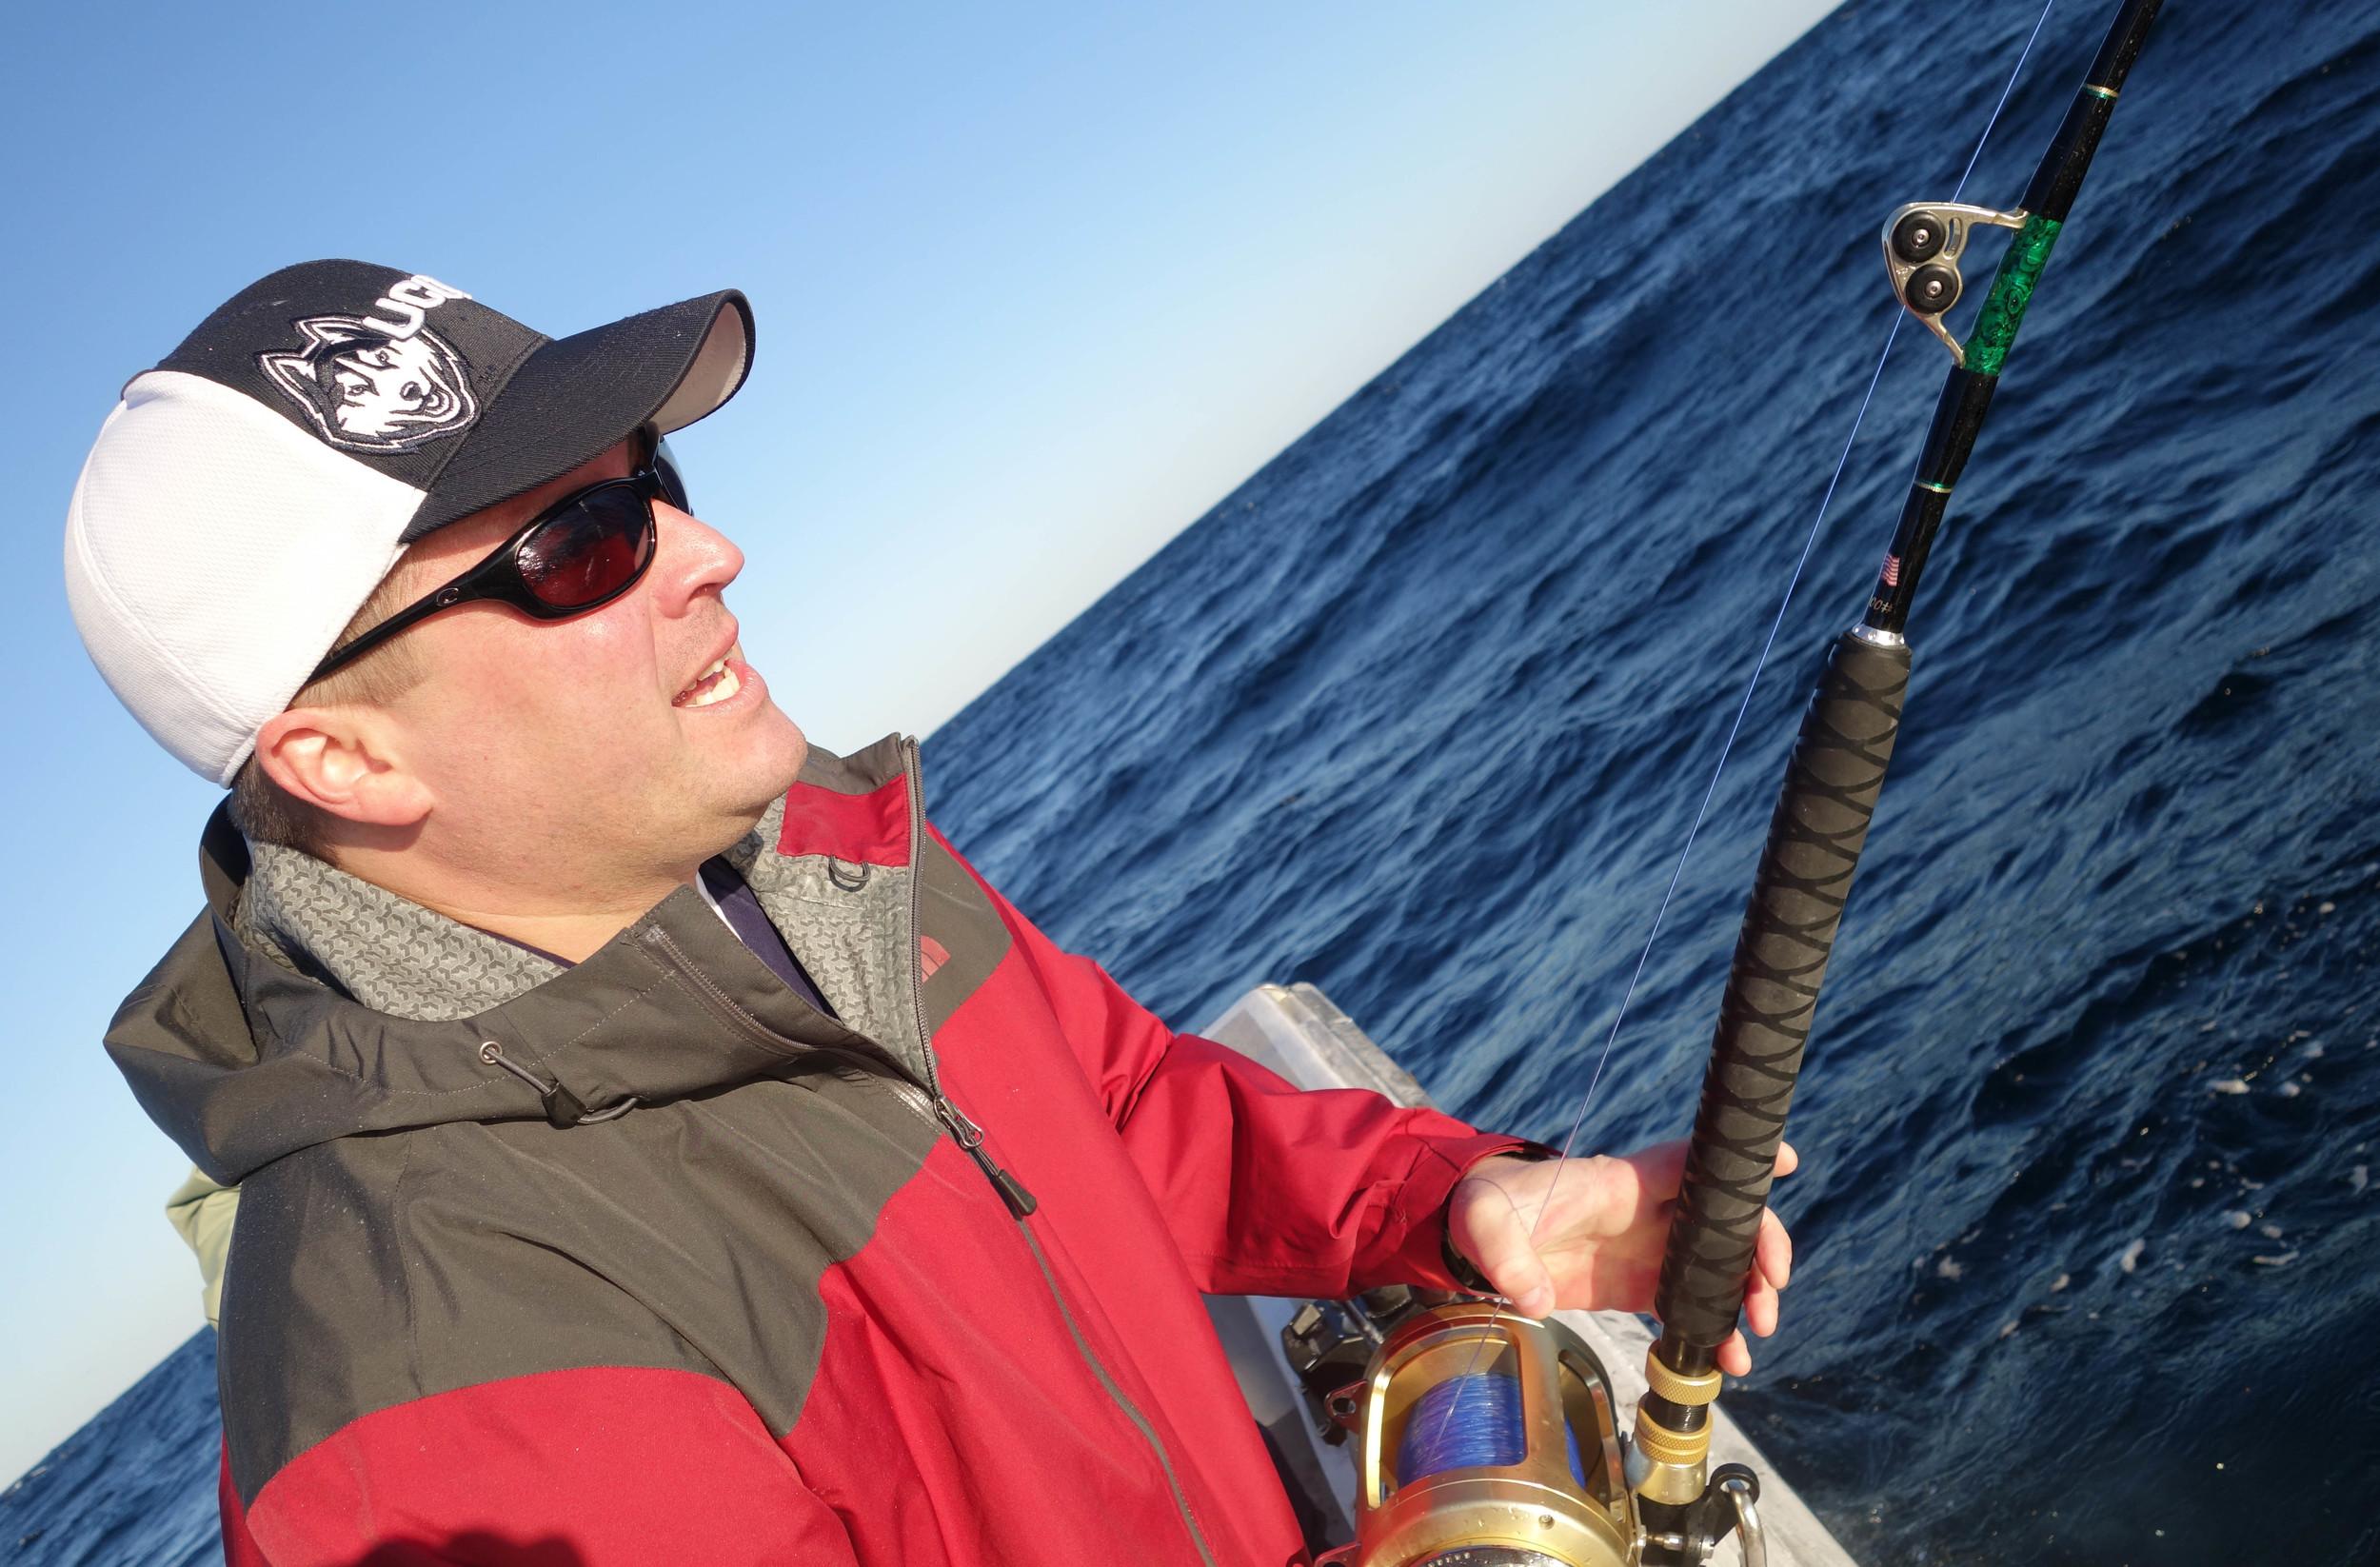 160 pound Tuna on the line